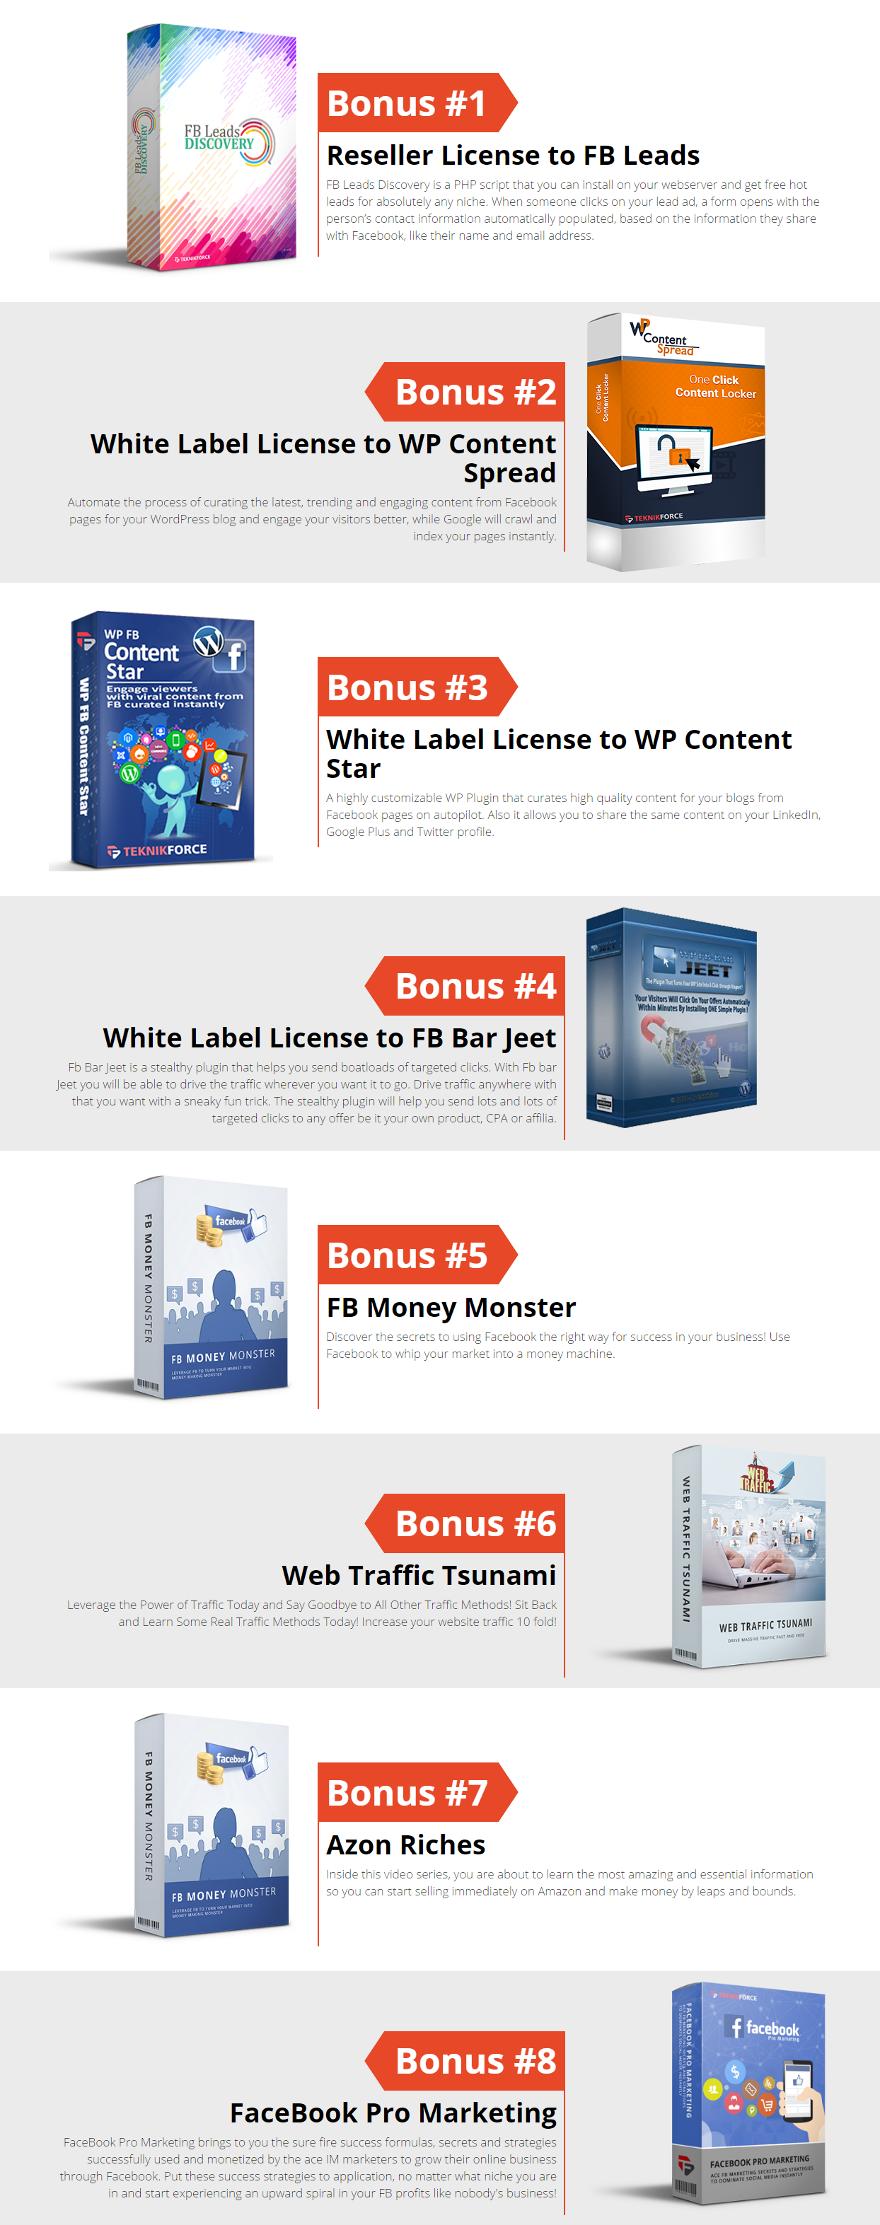 ClickMSG Bonuses